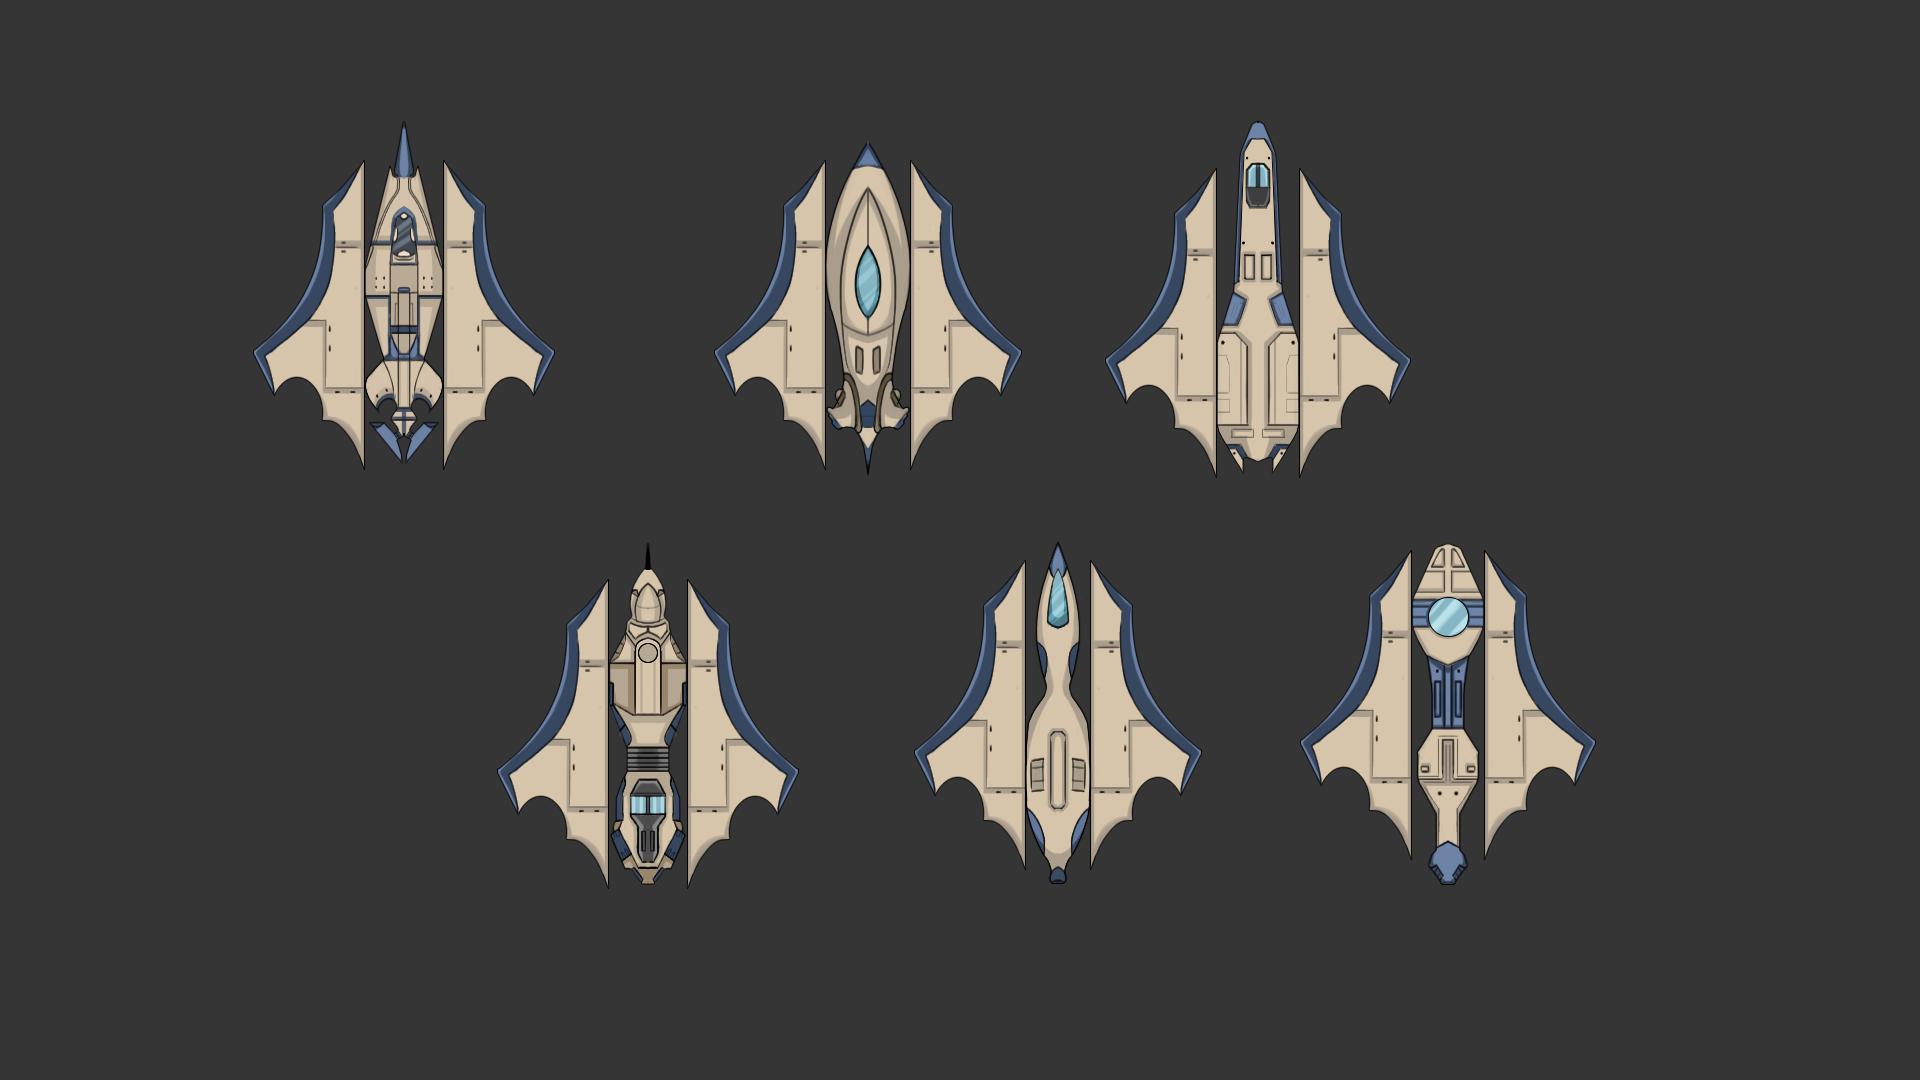 02192018spaceshipSilhouette.png